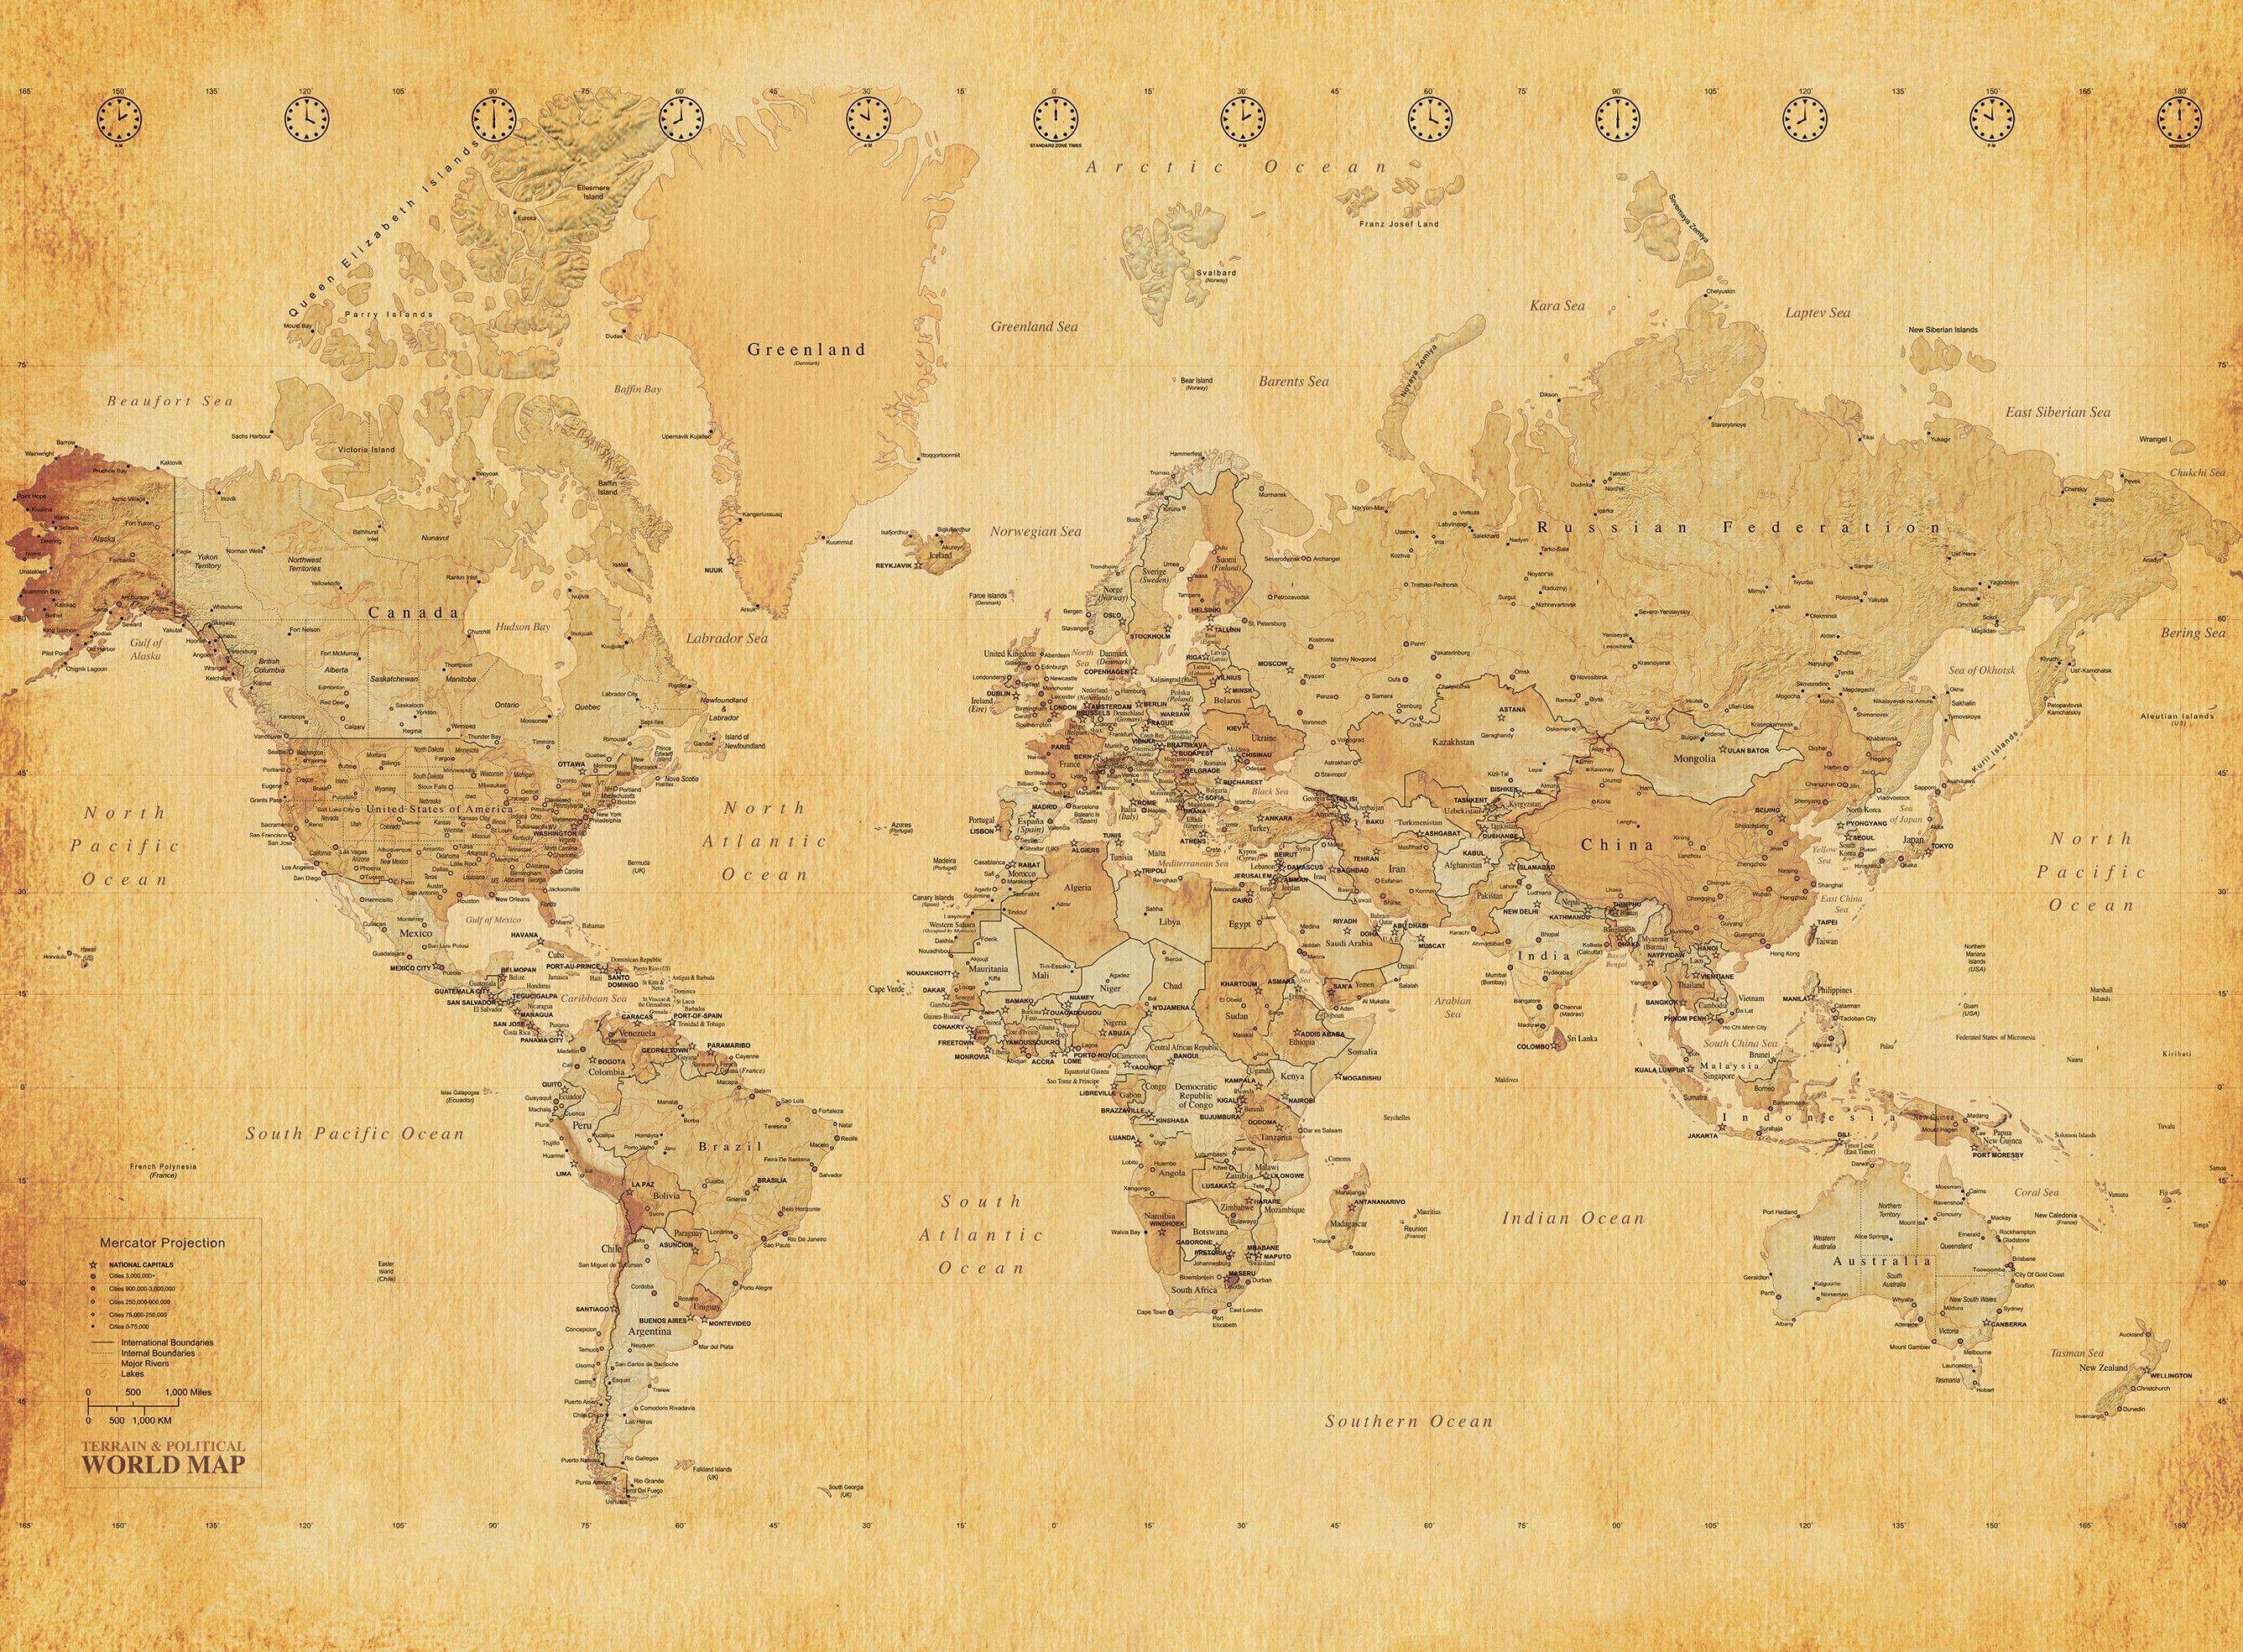 2673x1969 Hd Antique Map Background Hd Desktop Wallpapers Windows Wallpapers Smart Phone Backgr World Map Wallpaper Vintage World Map Poster Antique World Map